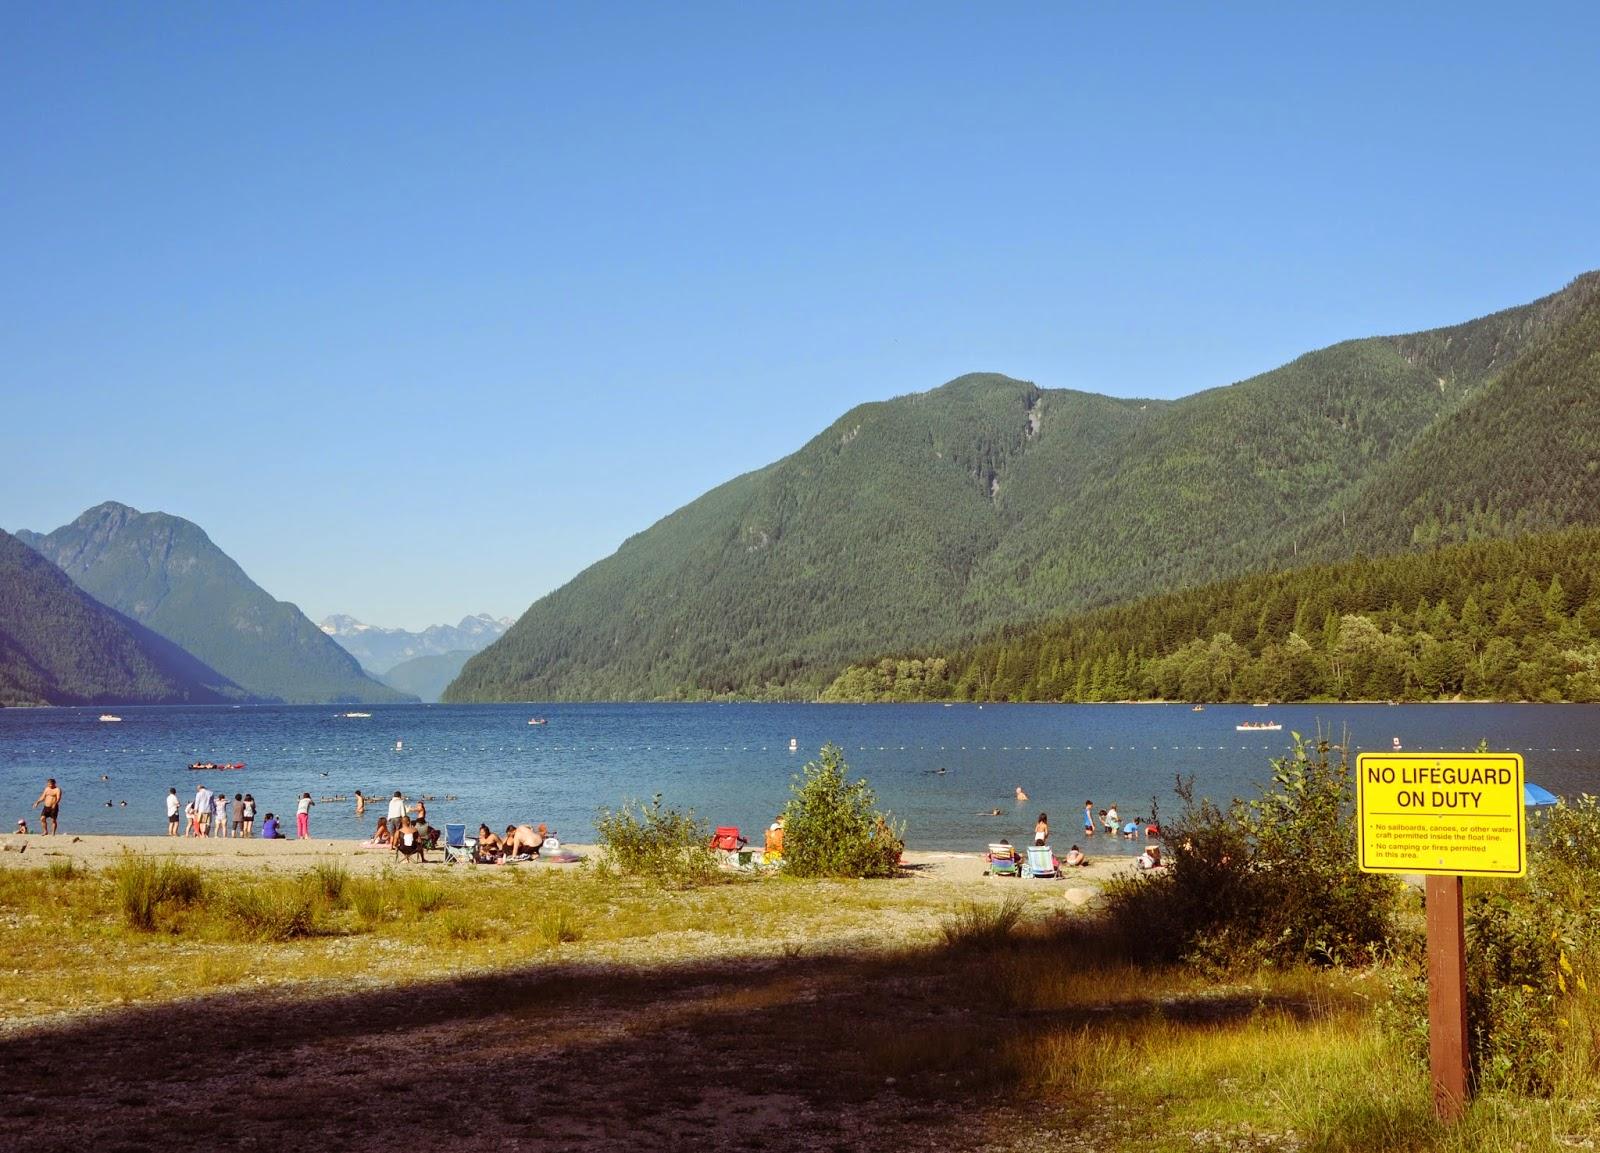 Alouette Lake, BC, Canada \ Озеро Аллуэт, Канада, Британская Колумбия